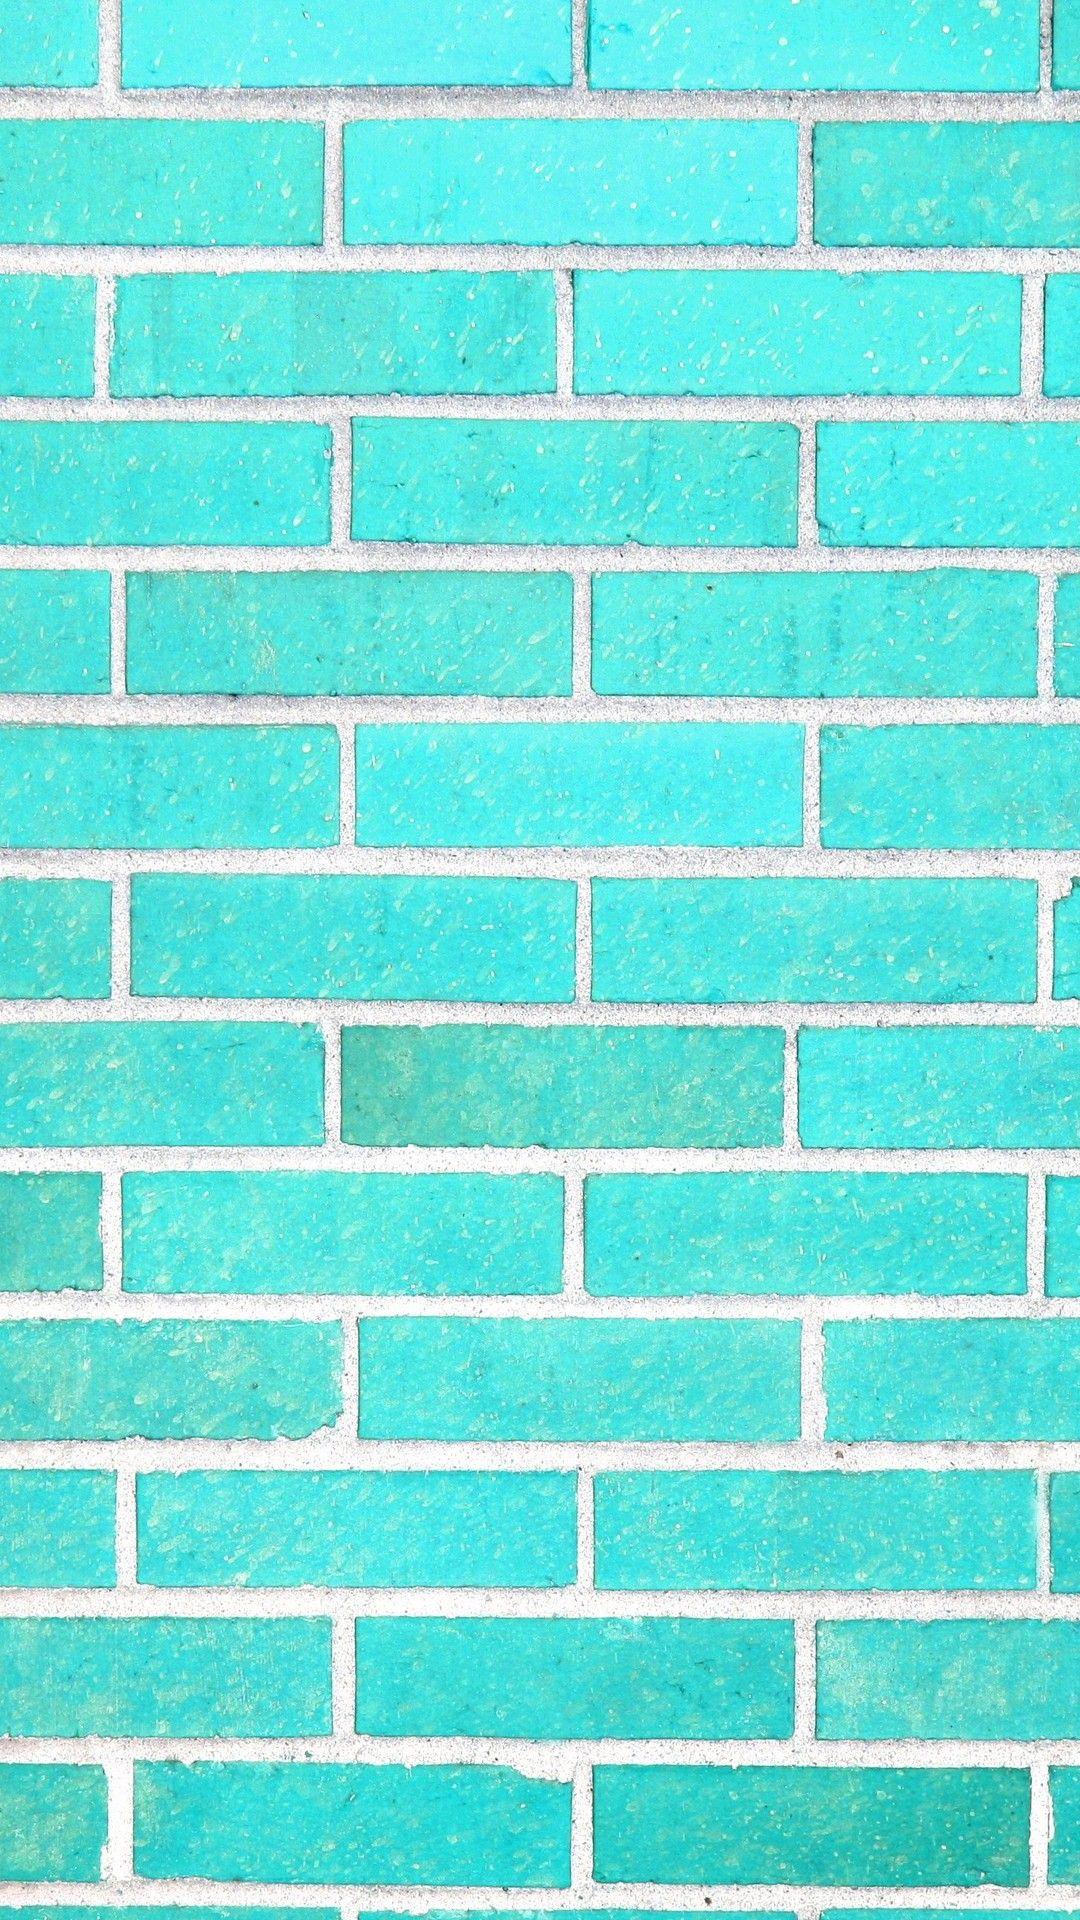 Baground Biru Tosca : baground, tosca, IPhone, Wallpapers, Wallpaper, Iphone,, Green, Turquoise